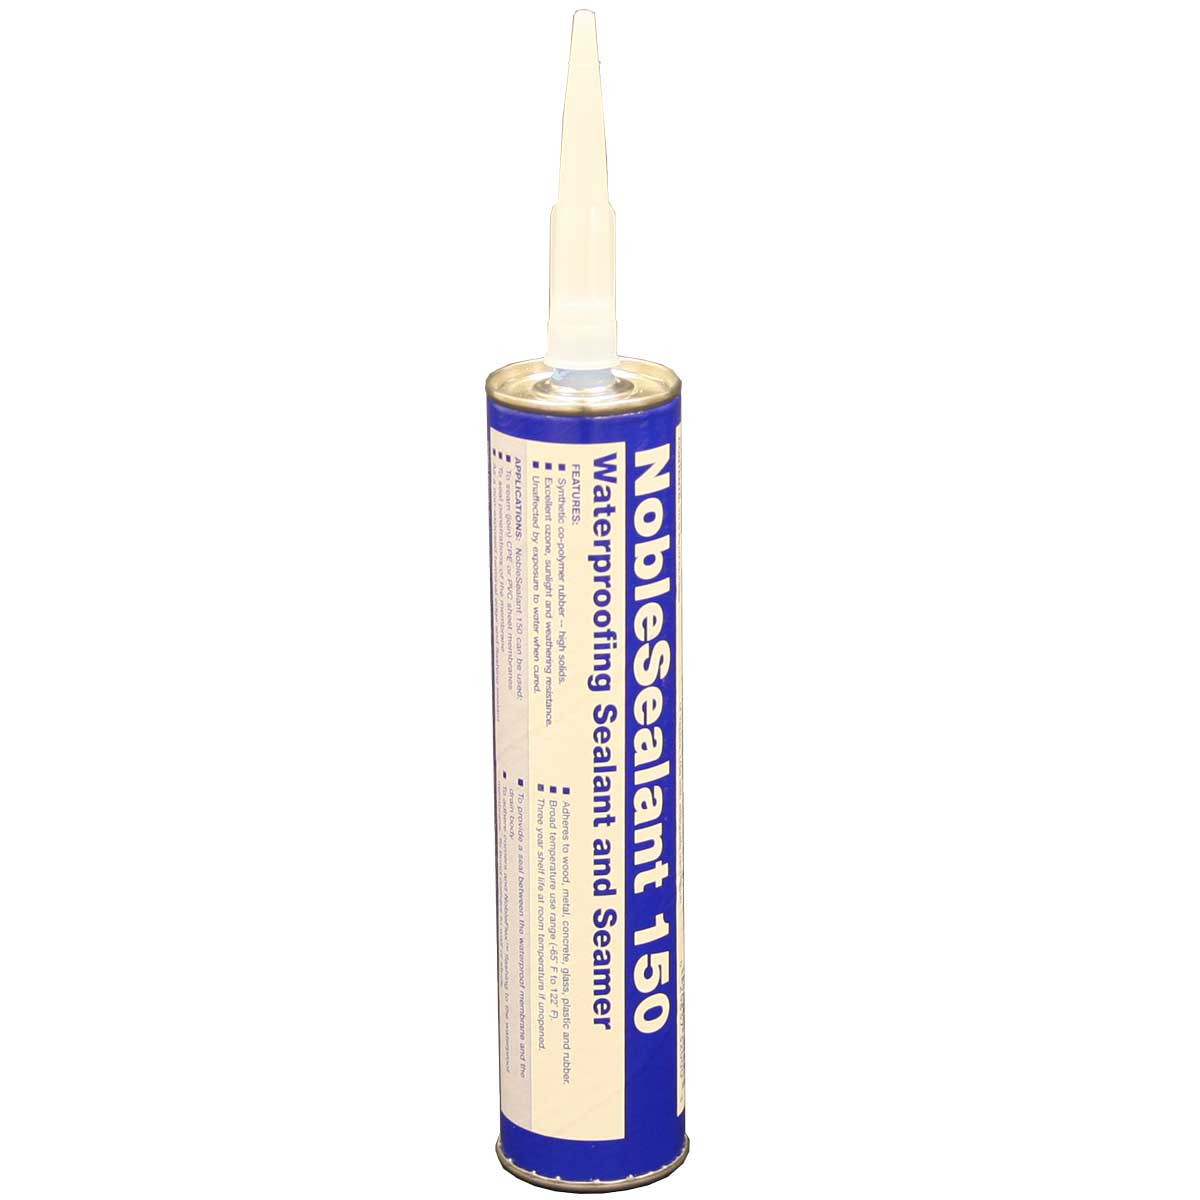 NobleSealant 150 Waterproofing tube